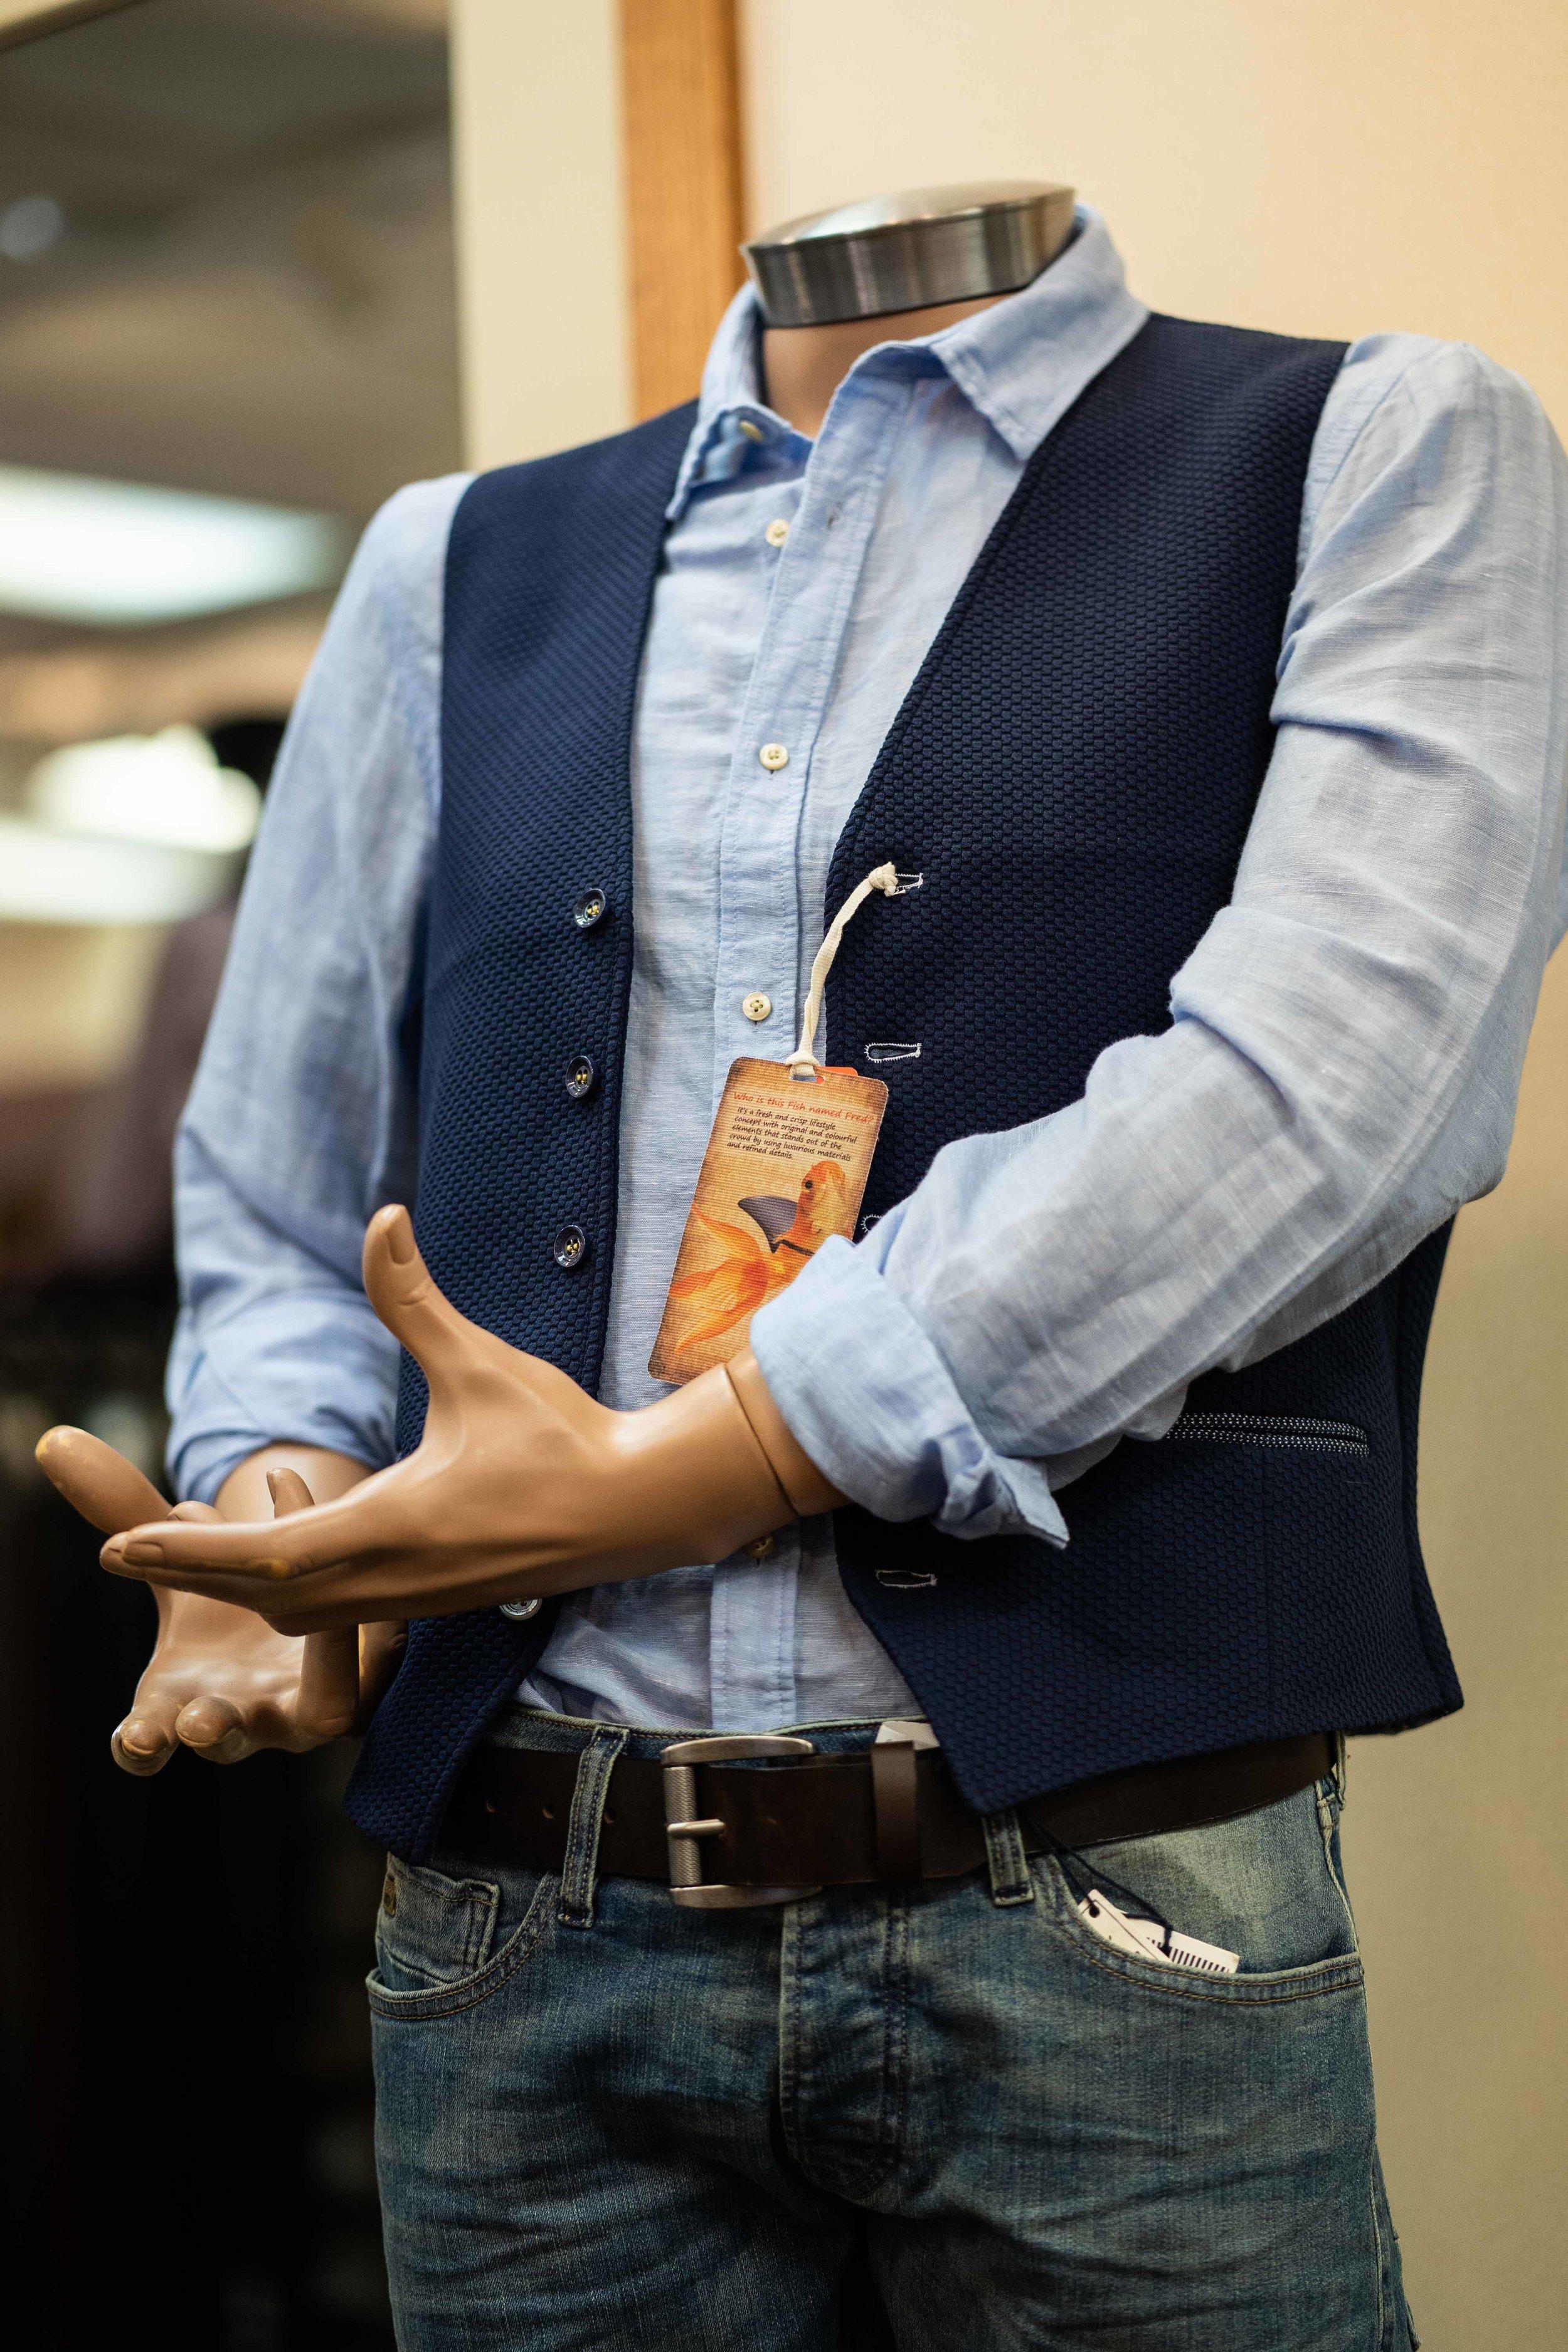 manikin with vest and belt.jpg